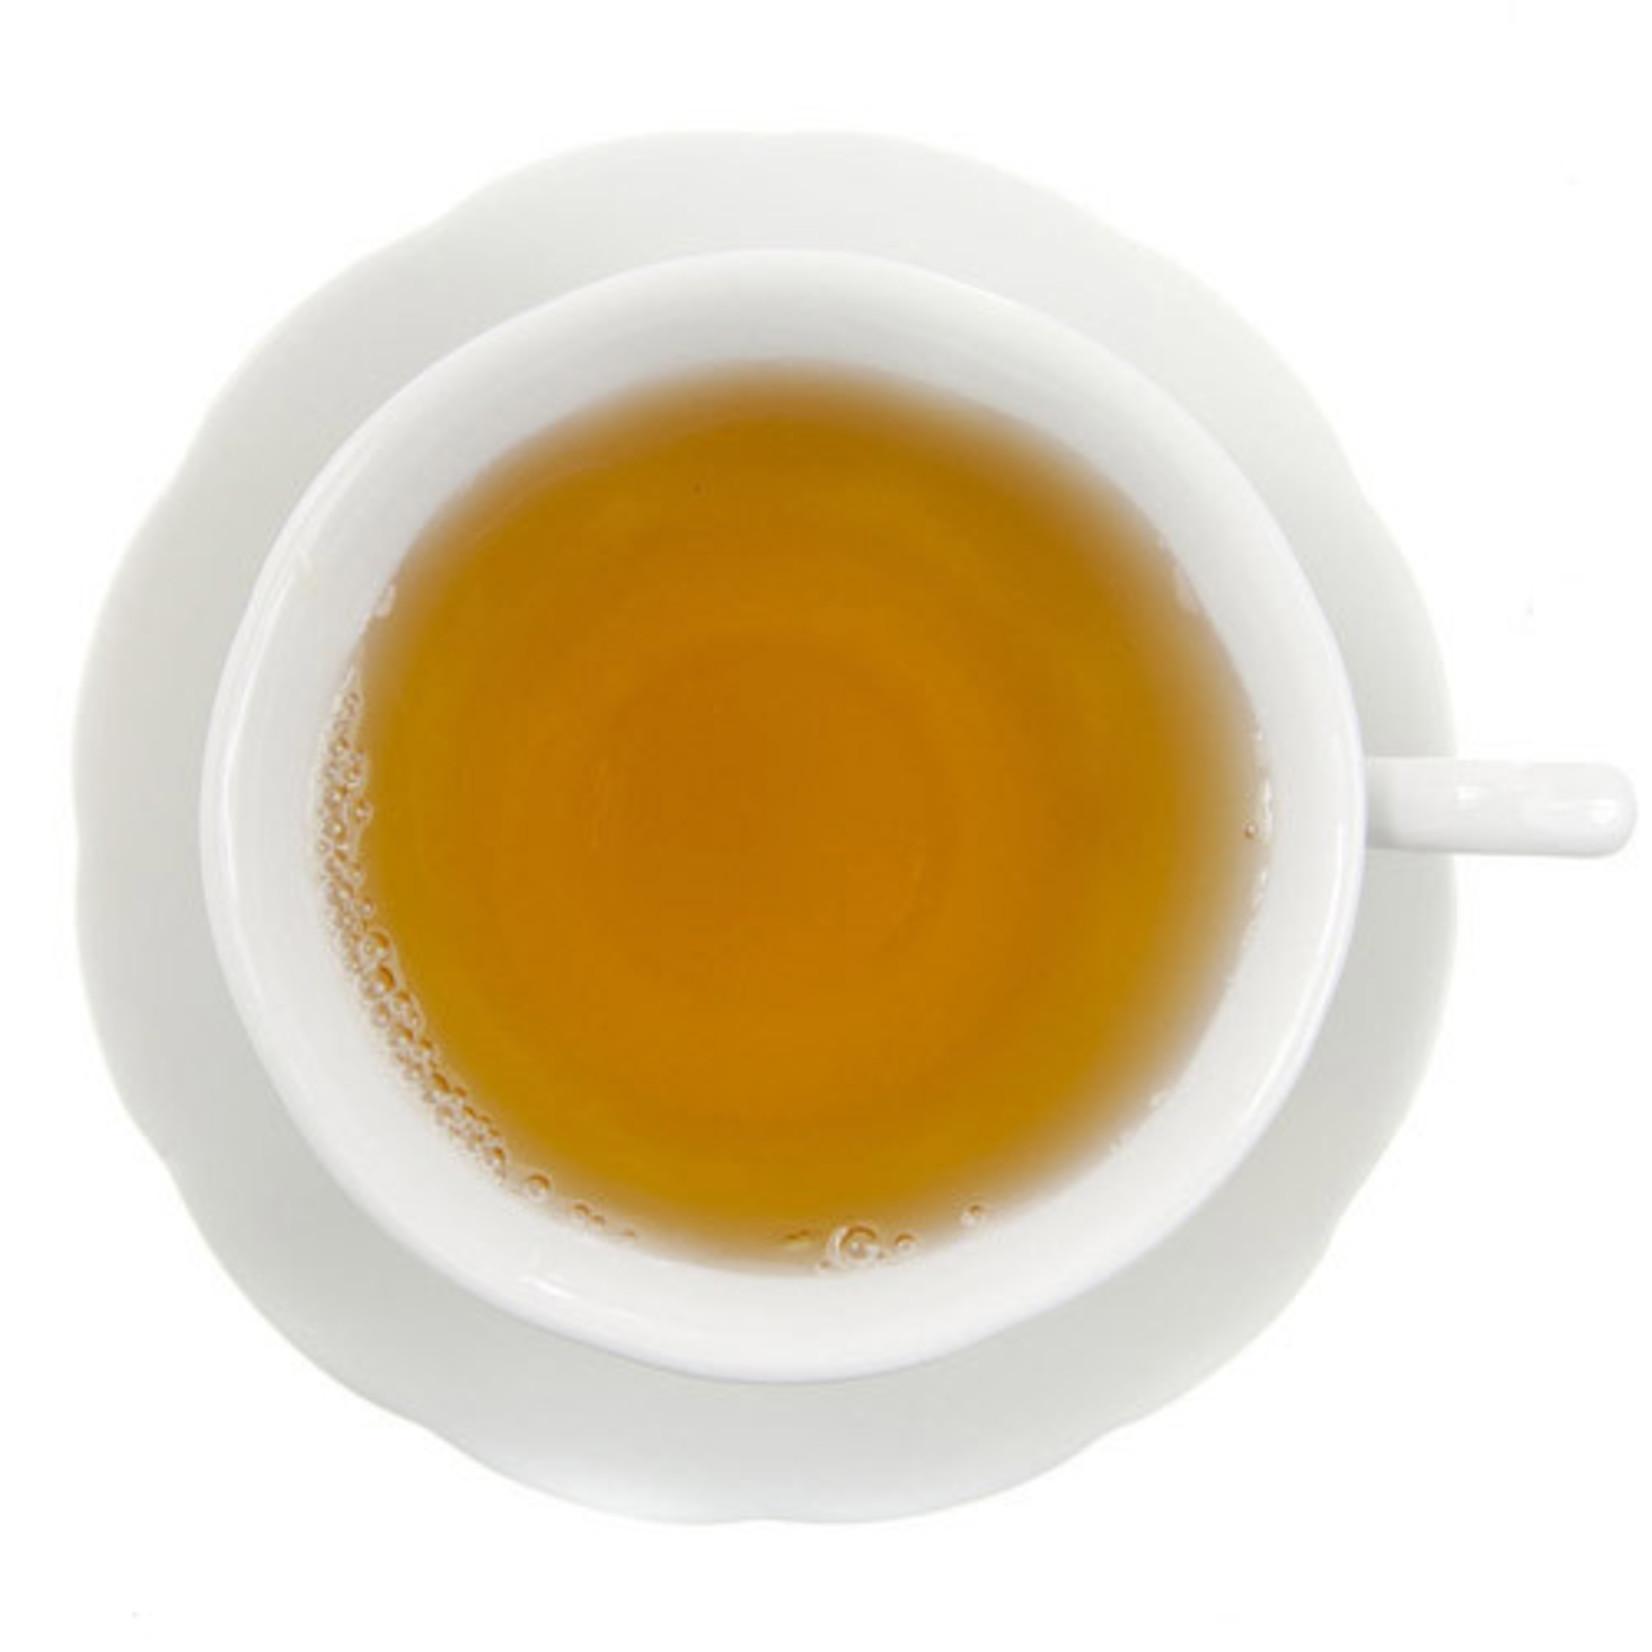 BrewBakers Tea Peppermint Willamette 50g